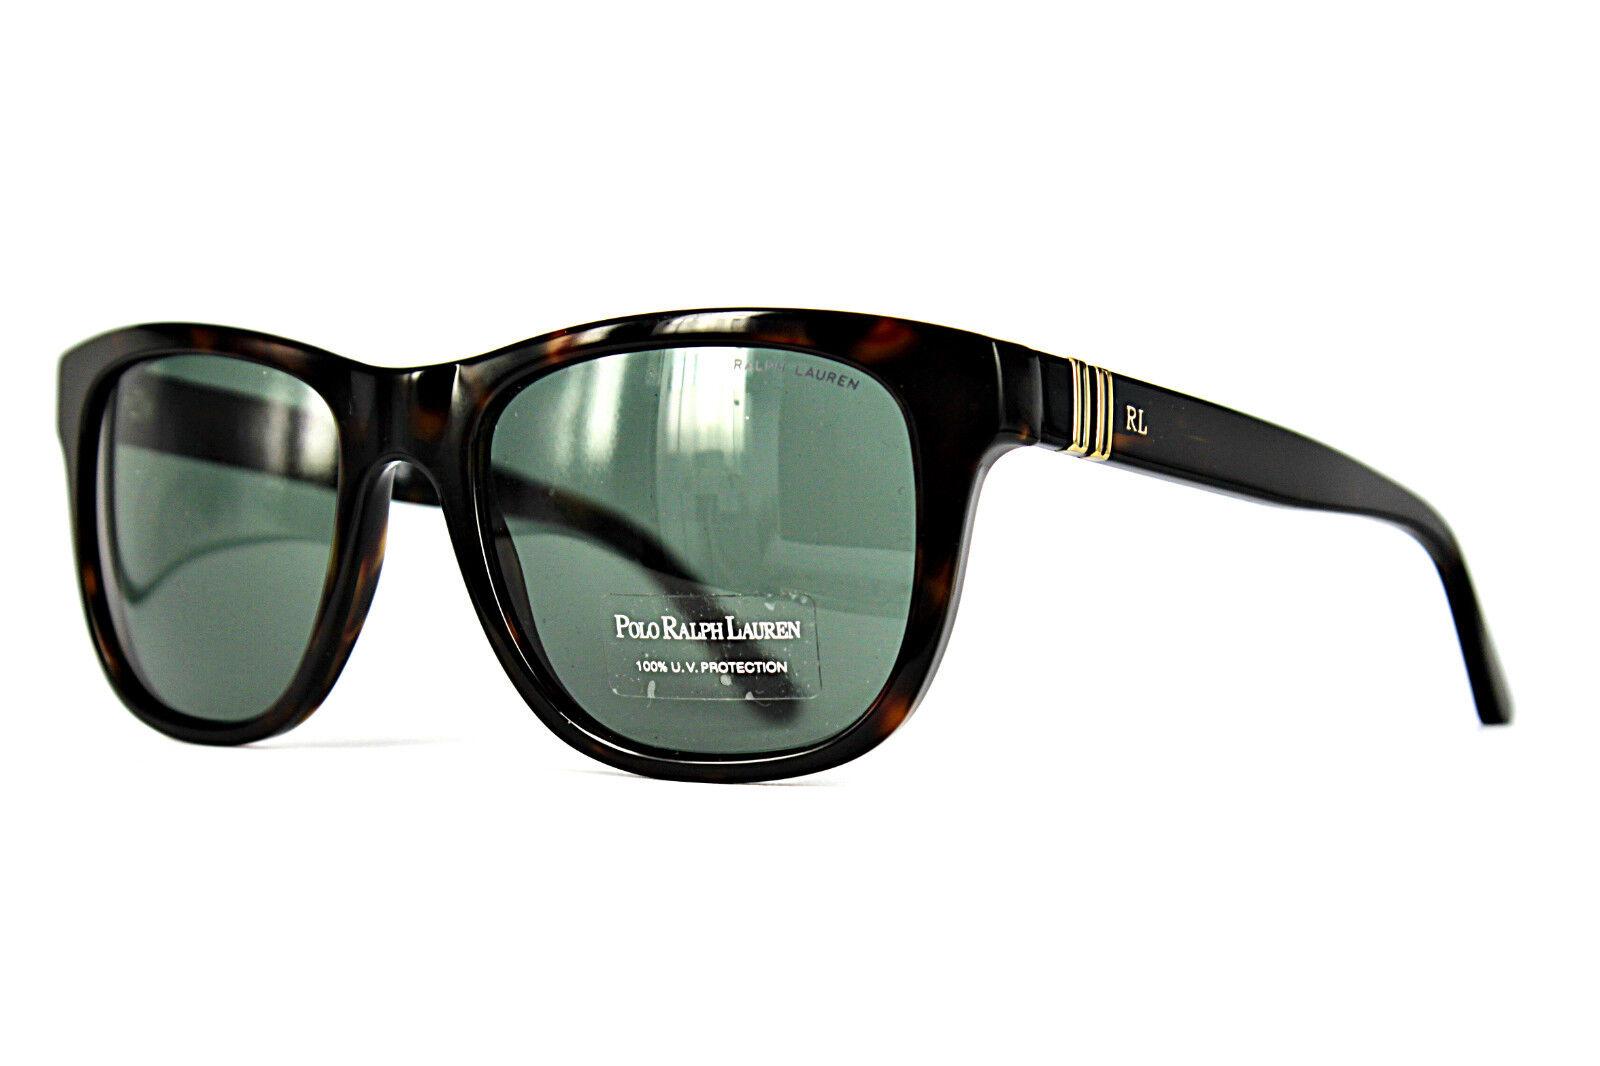 Polo Ralph Lauren Sonnenbrille Sunglasses PH4090 PH4090 PH4090 5003 71 54 Konkursauf  441B(28)  | Perfekt In Verarbeitung  1d6c78